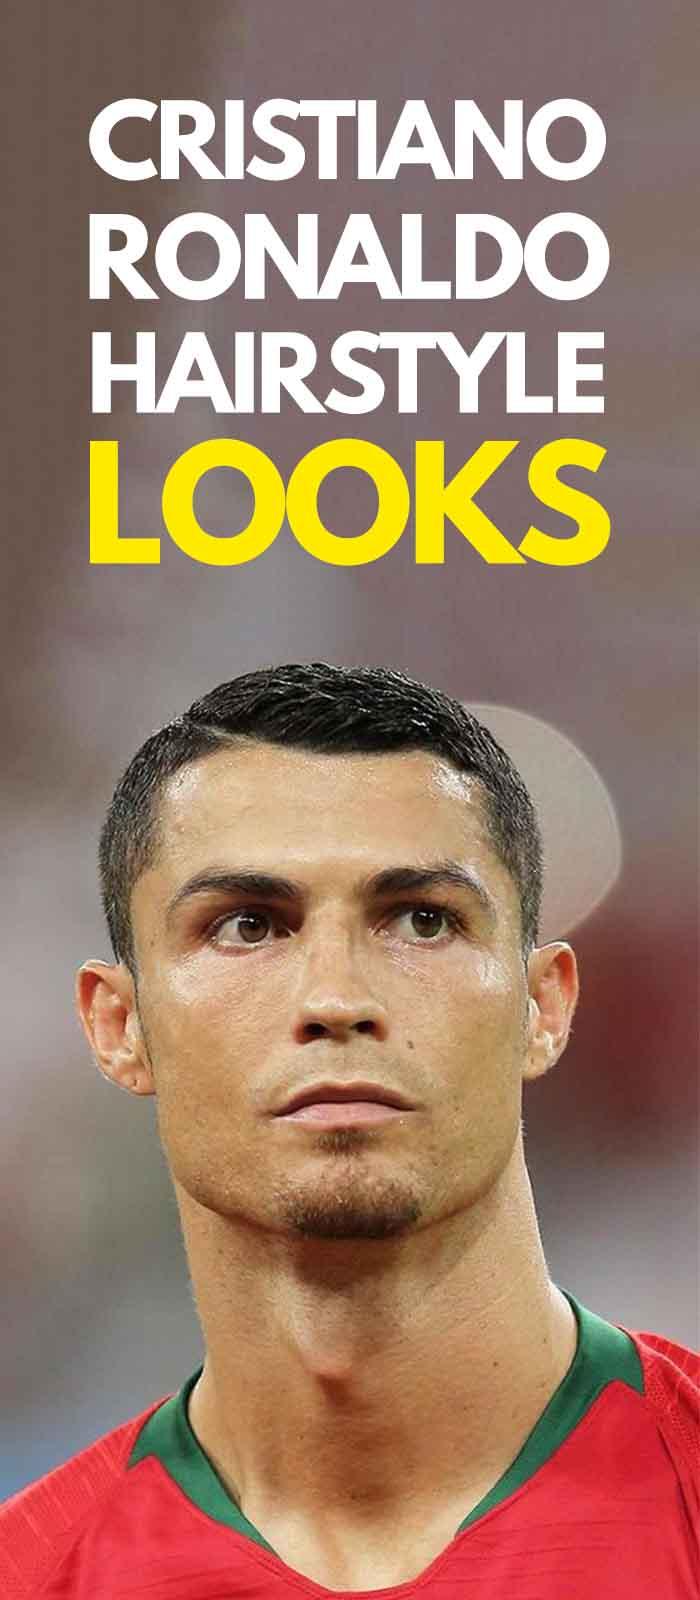 Hairstyle Looks Cristiano Ronaldo 2019